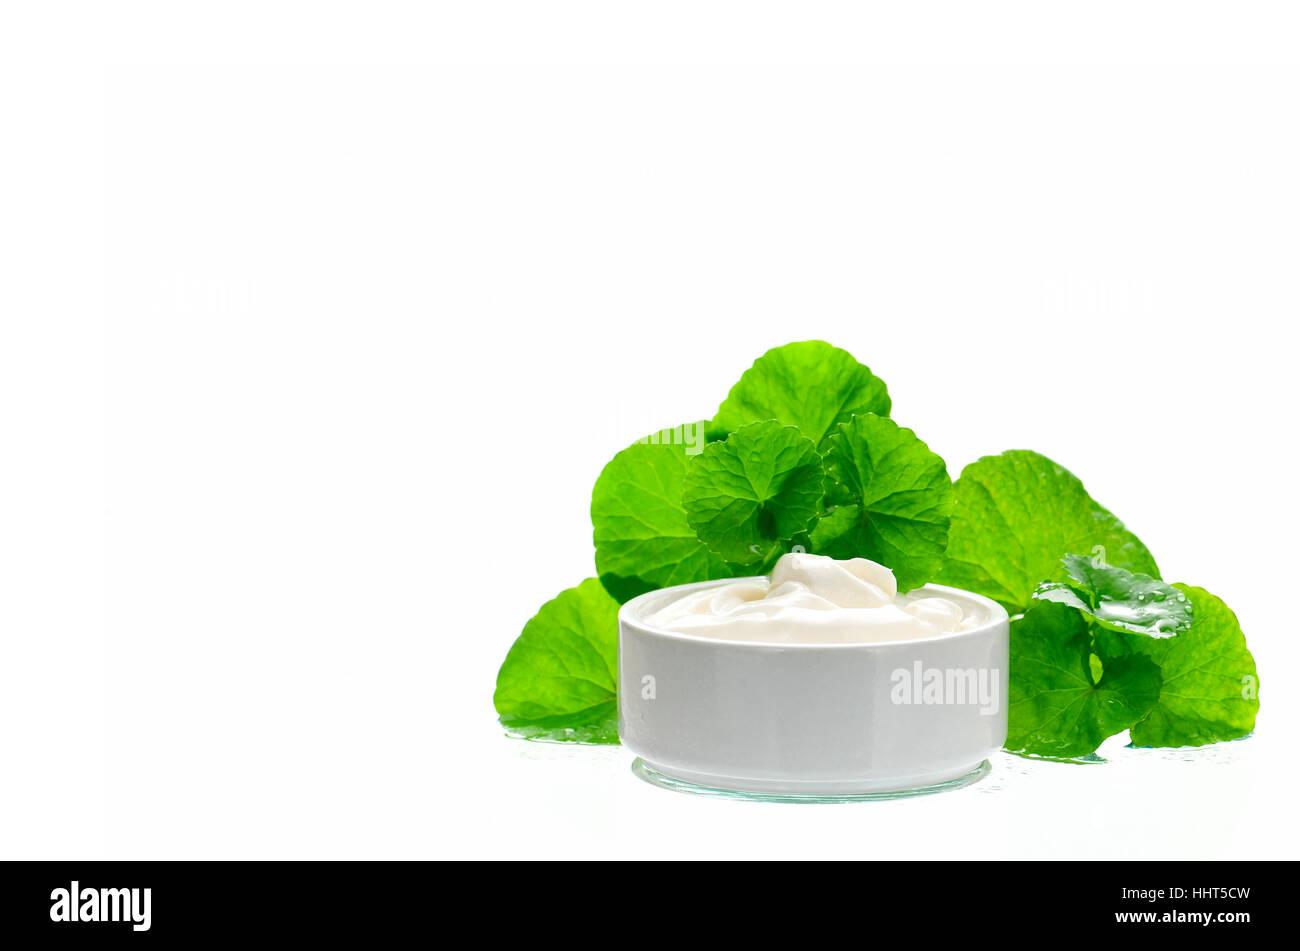 Indian pennywort (Centella asiatica (L.) Urban.) anti-aging skin care product. - Stock Image